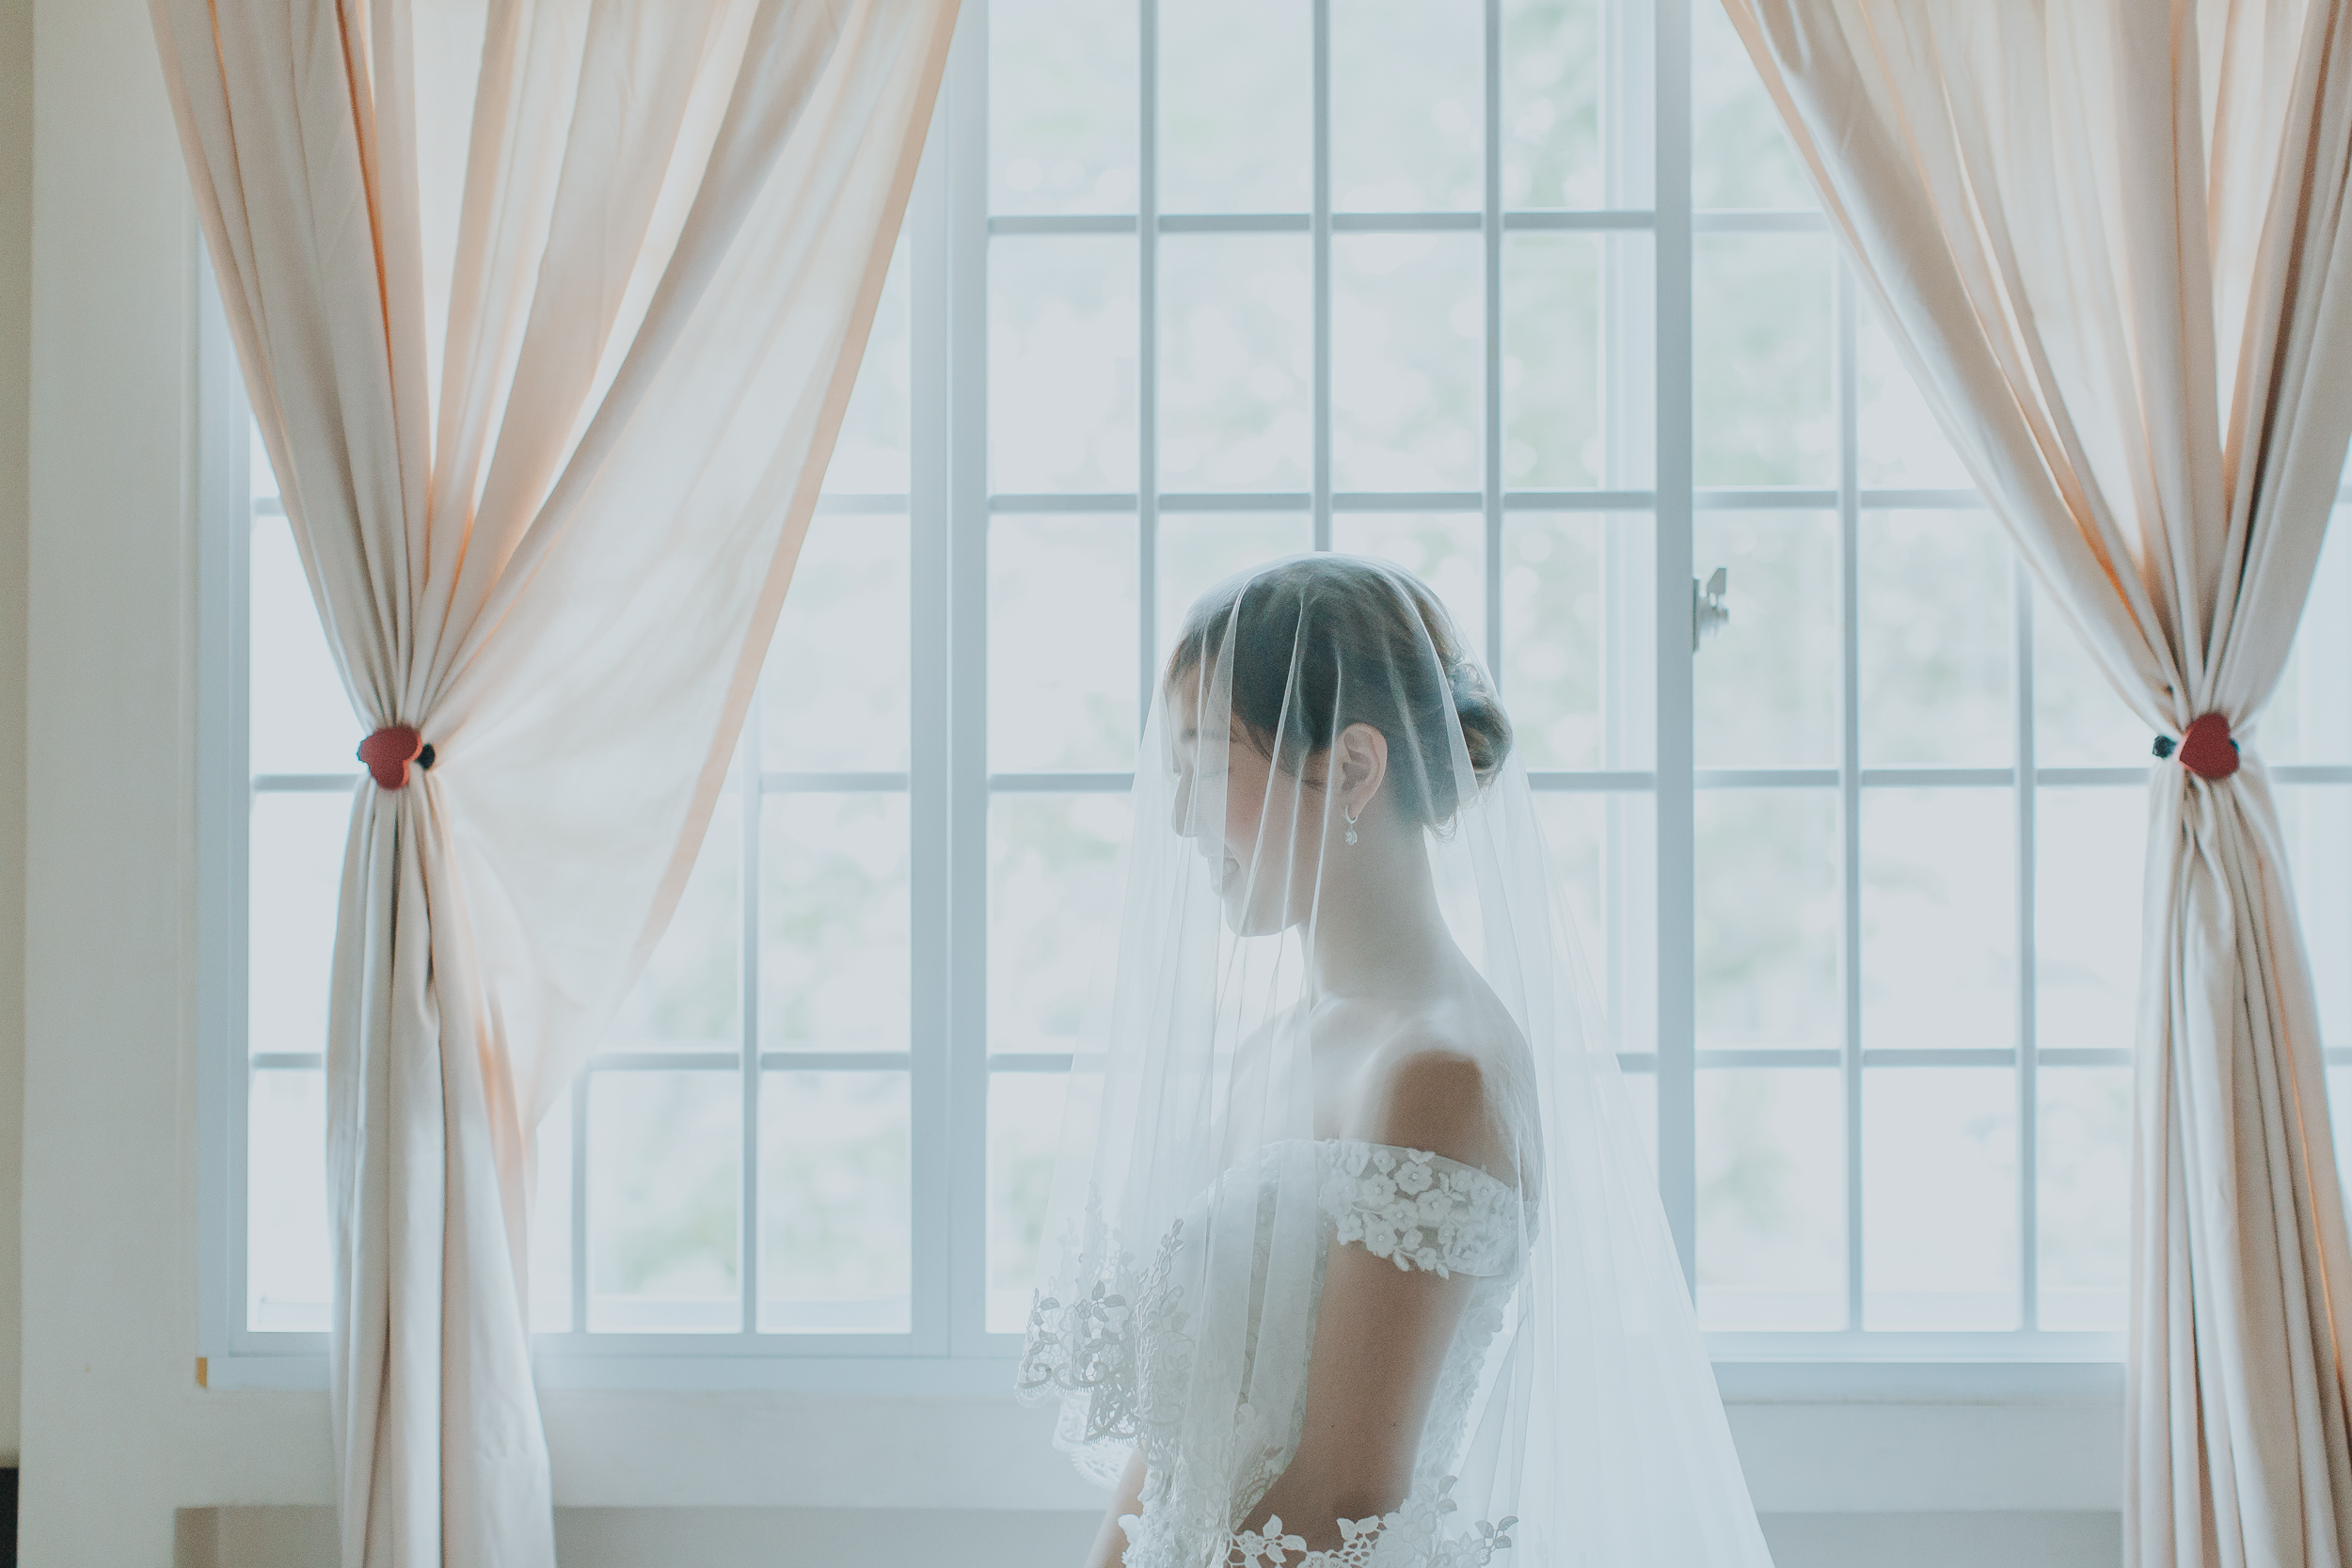 Singapore+Actual+Day+Wedding+Photographer+Grand+Mercure+Oliver+Estelle-0015.jpg